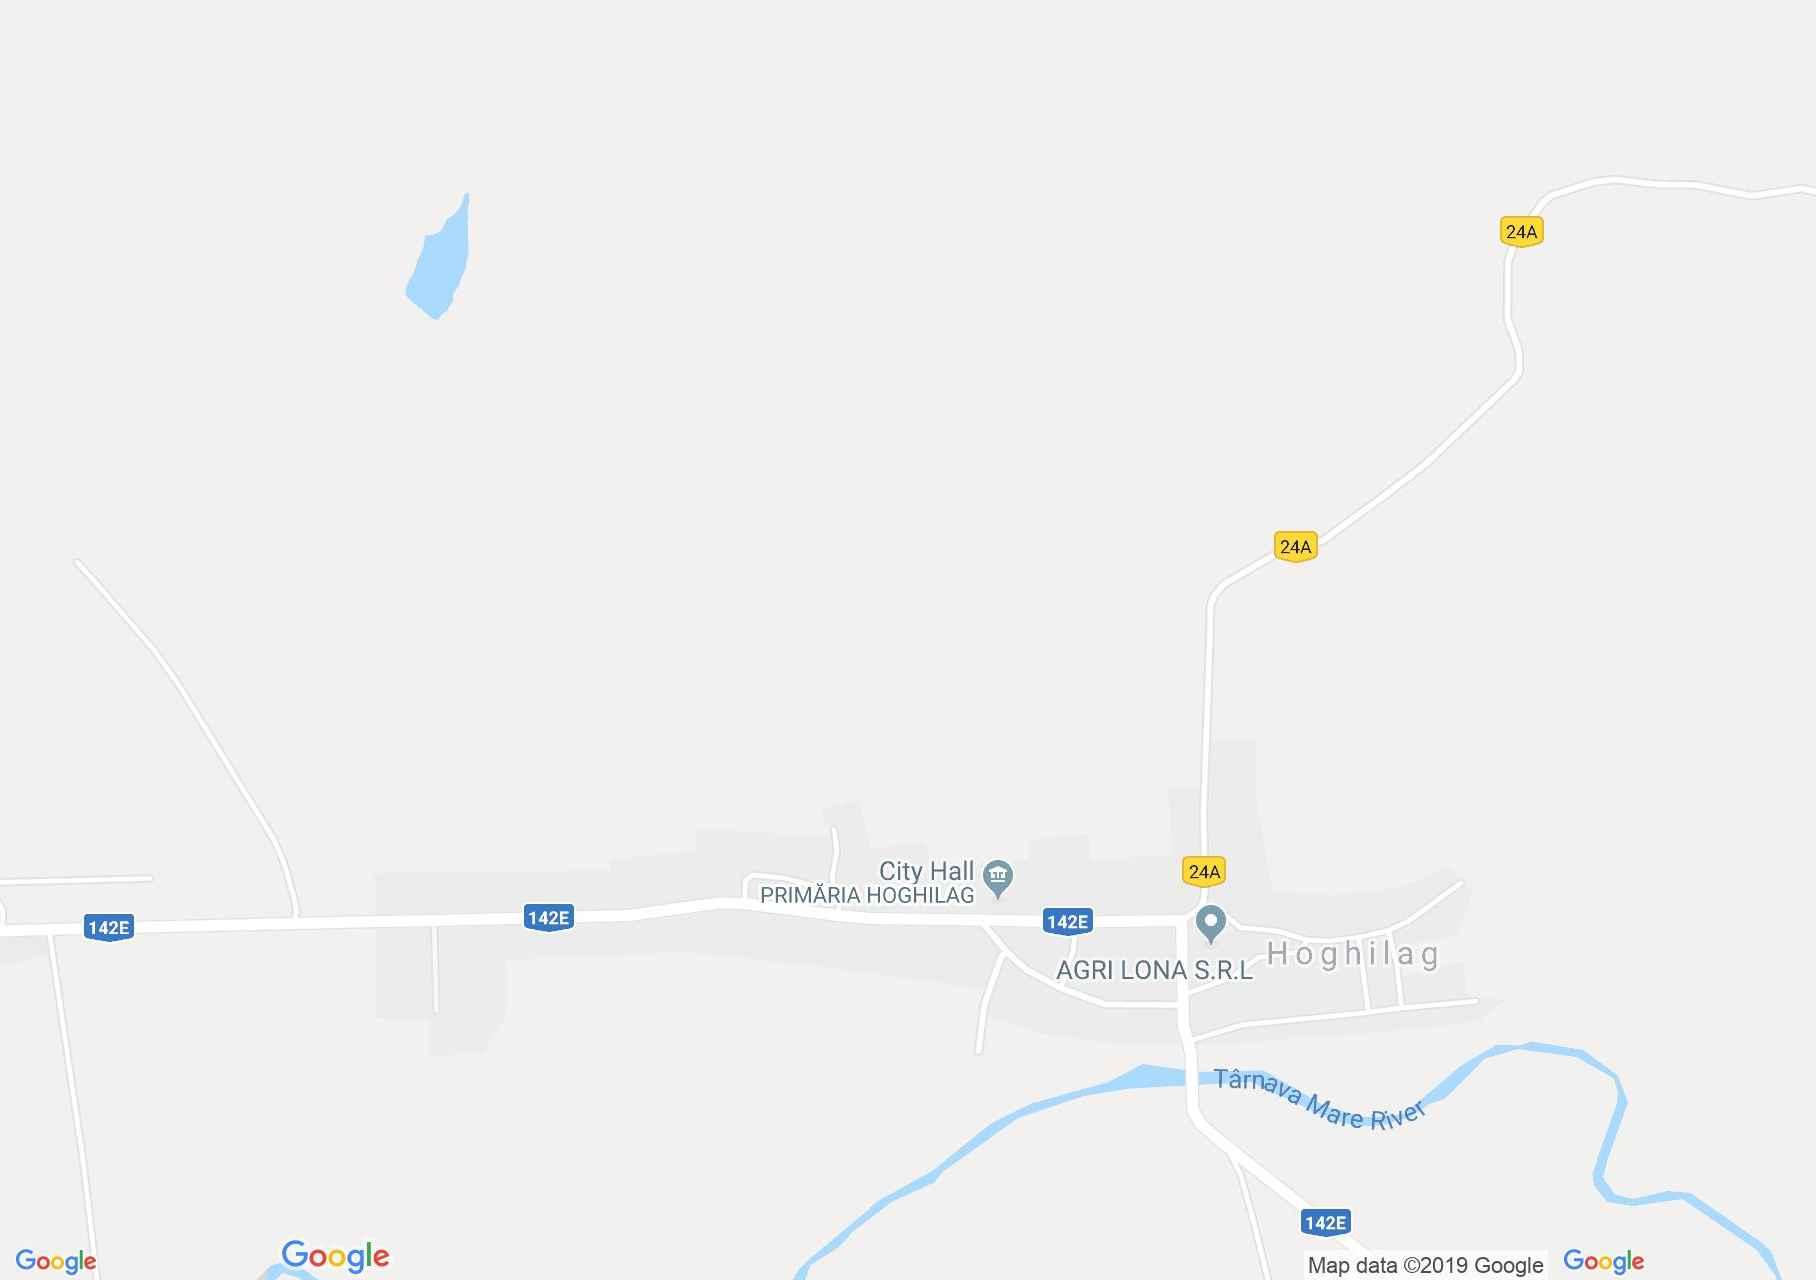 Holdvilág: Evangélikus erődtemplom (térkép)